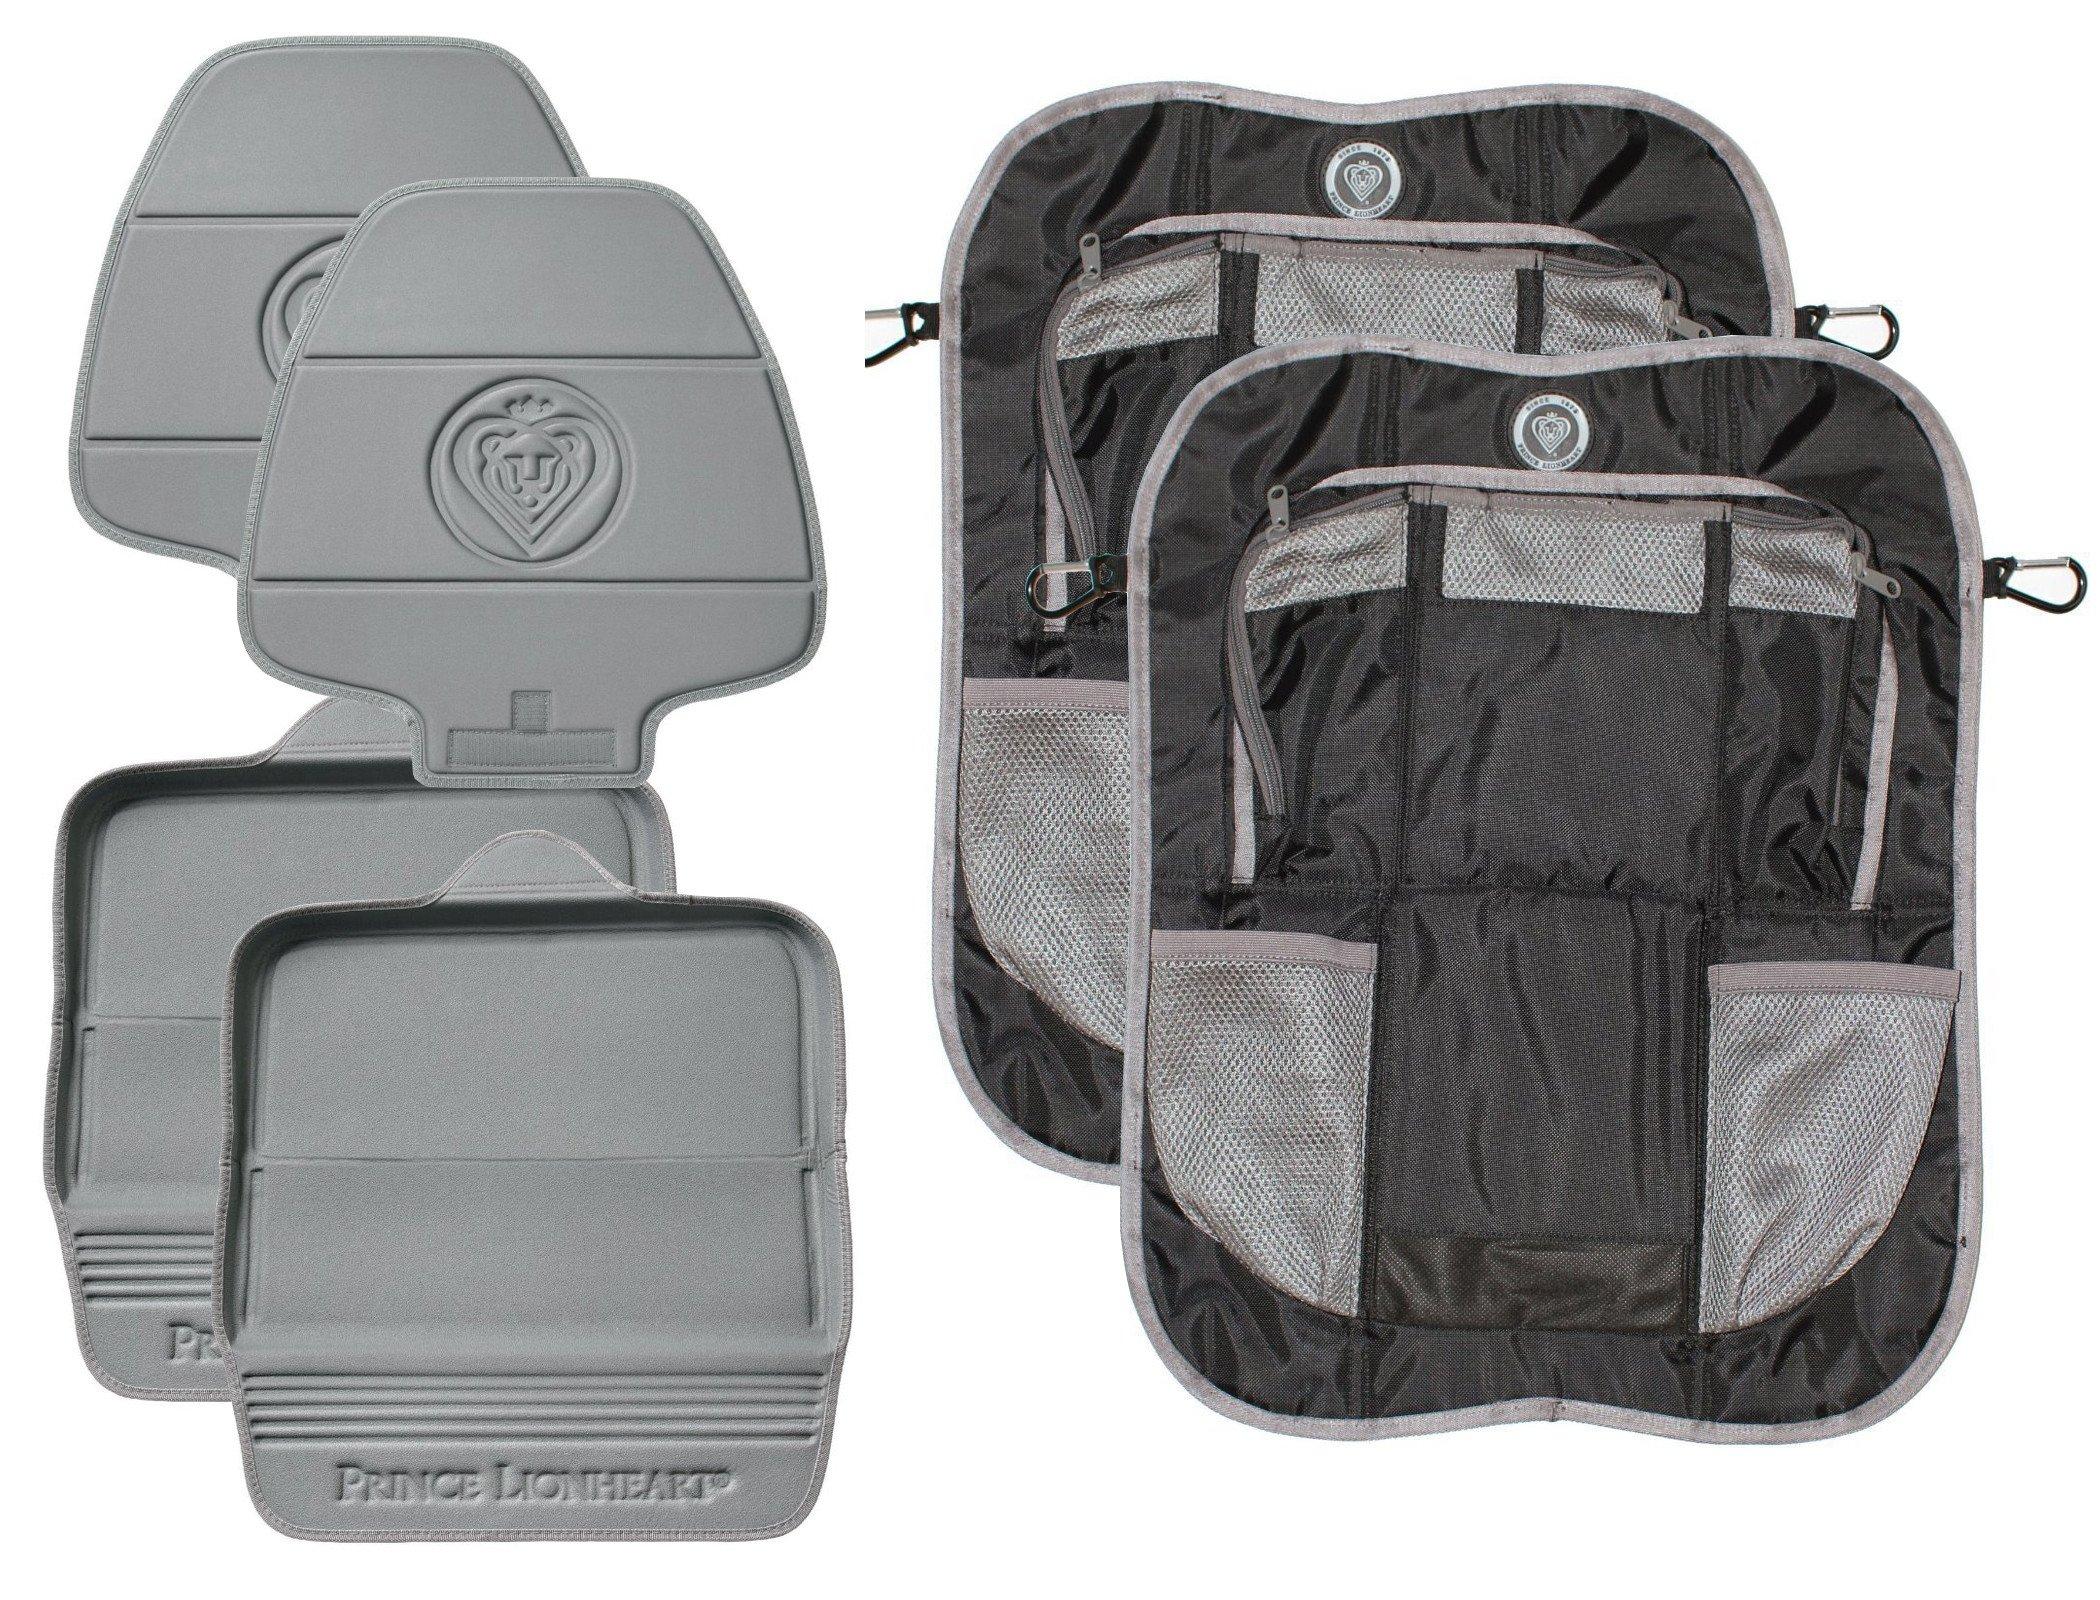 Prince Lionheart 2 Stage Seatsavers with Backseat Organizers, Set of 2, Grey/Black